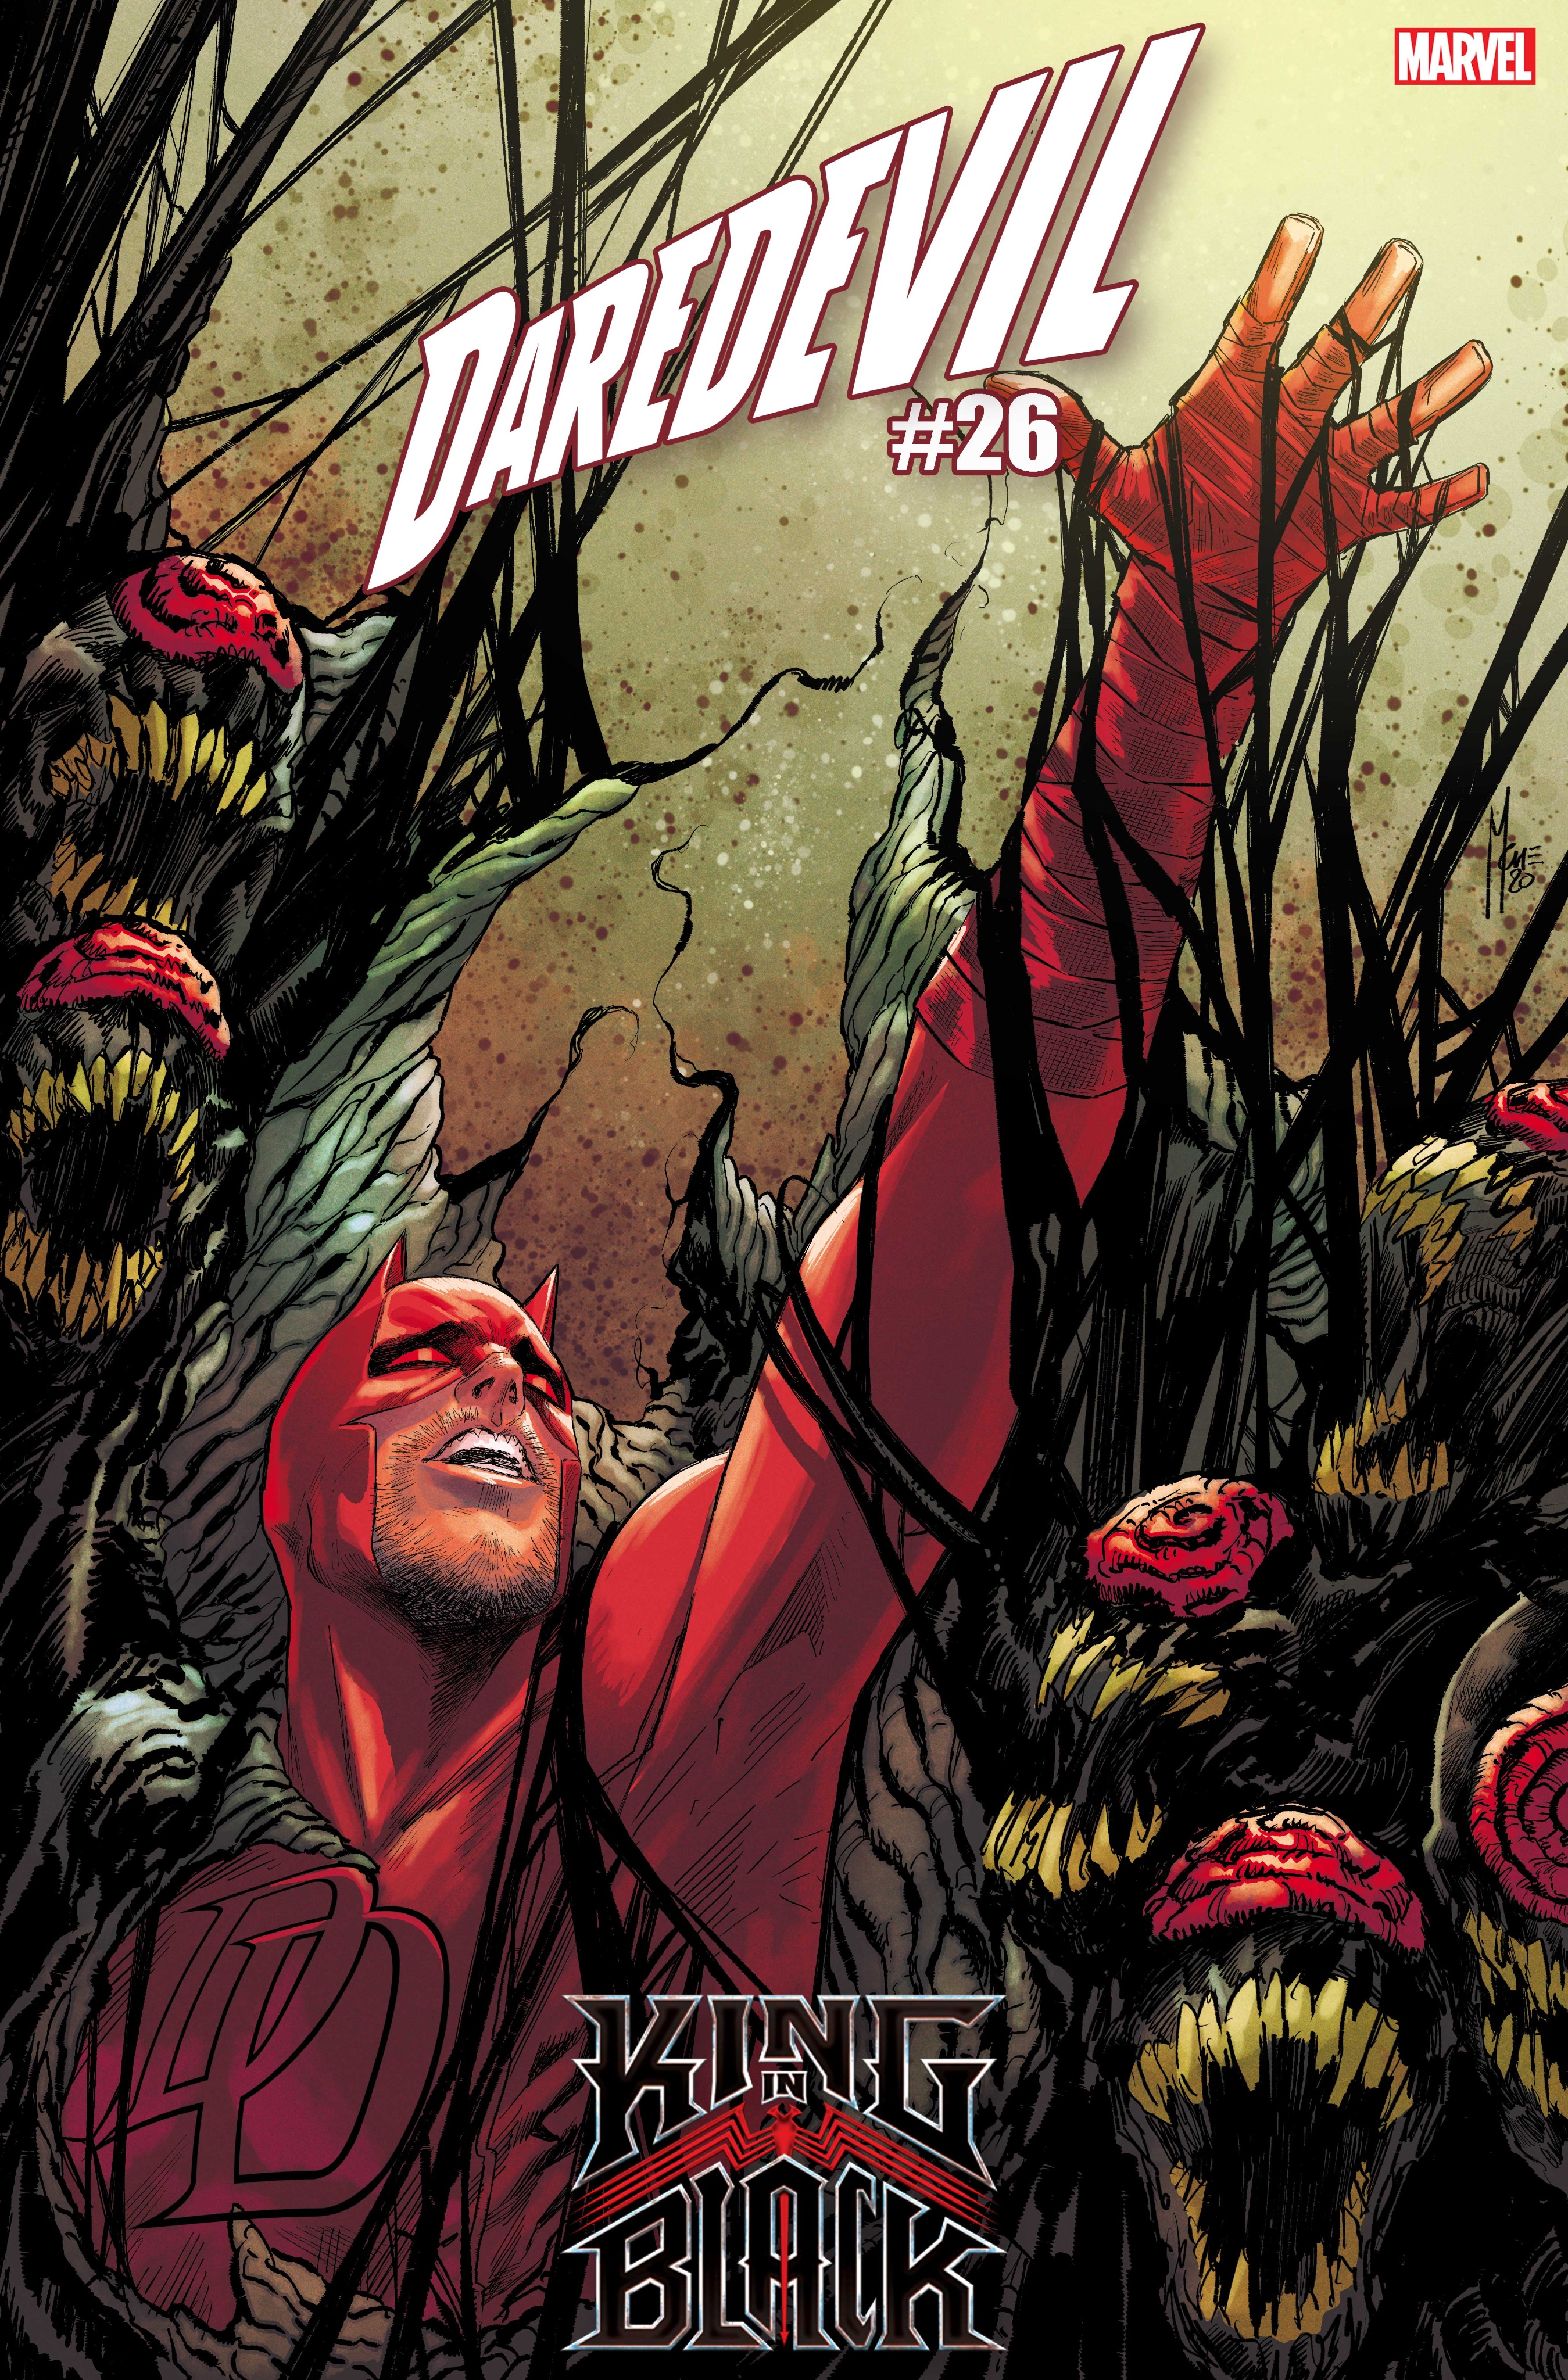 Daredevil #26 - okładka